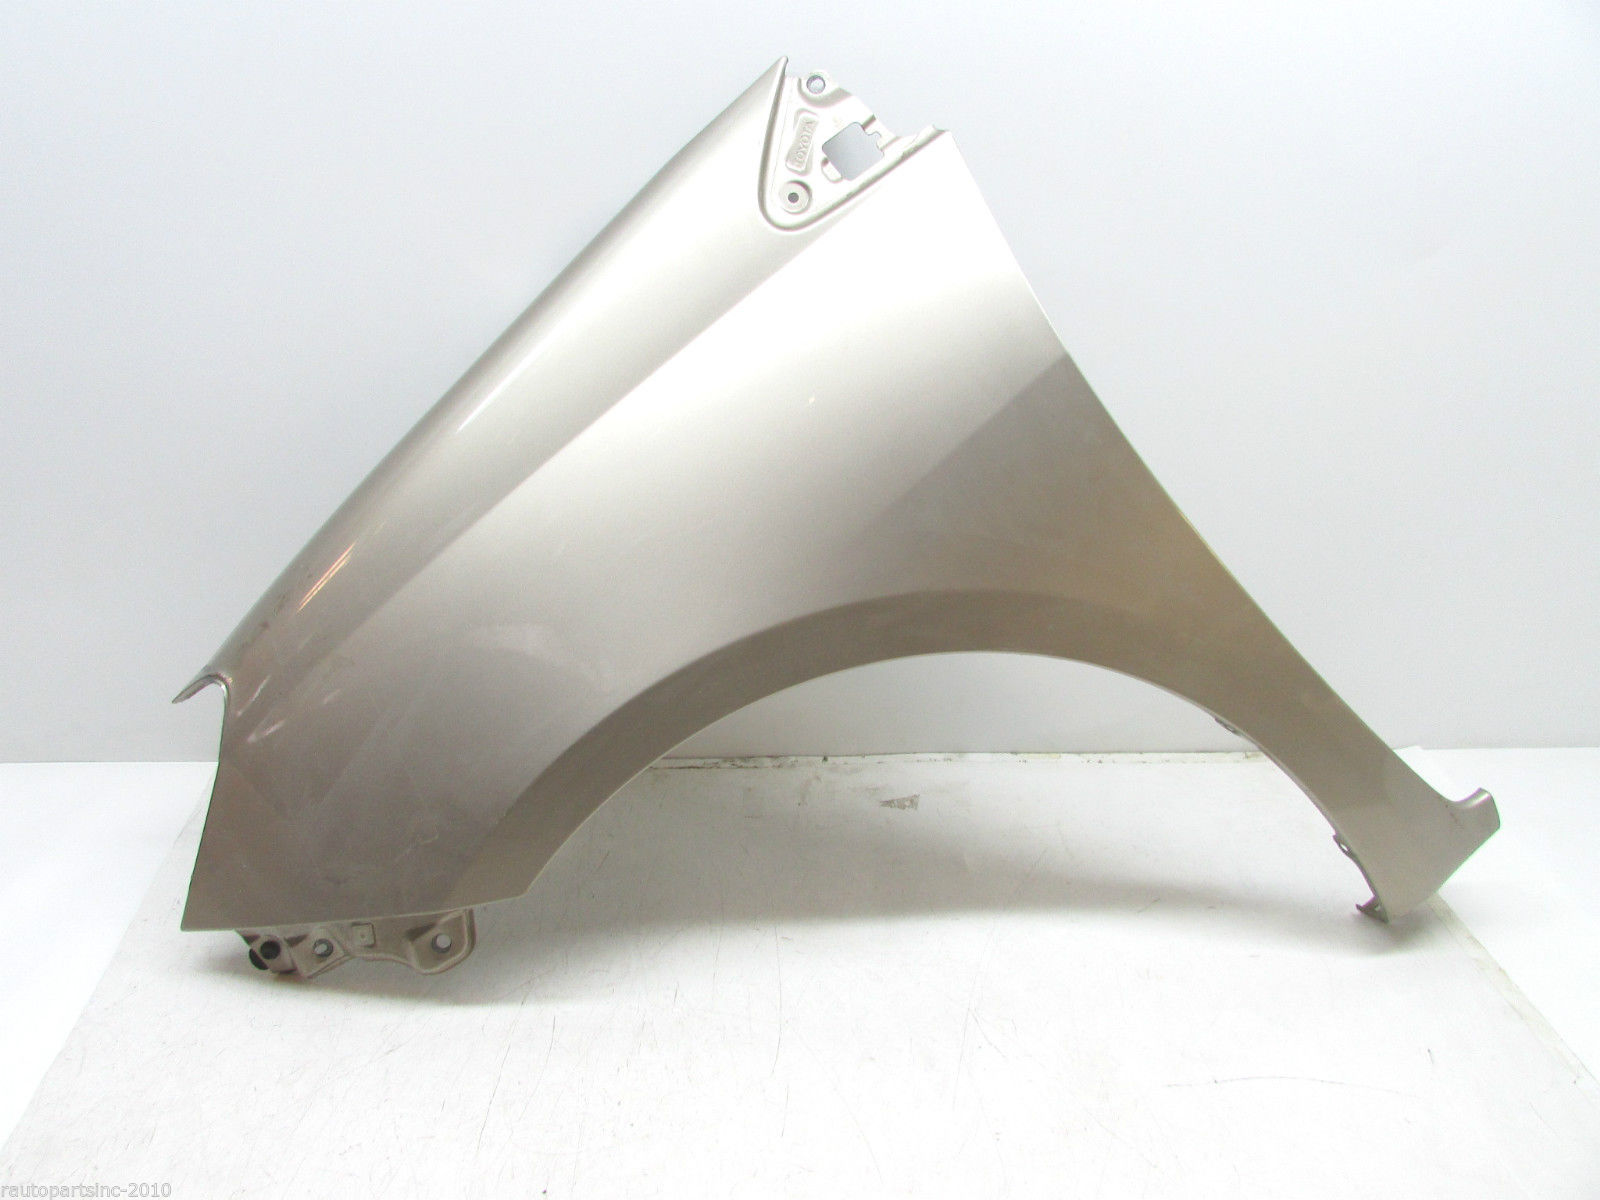 Fender For 2004-2010 Toyota Sienna Front Driver Primed Steel